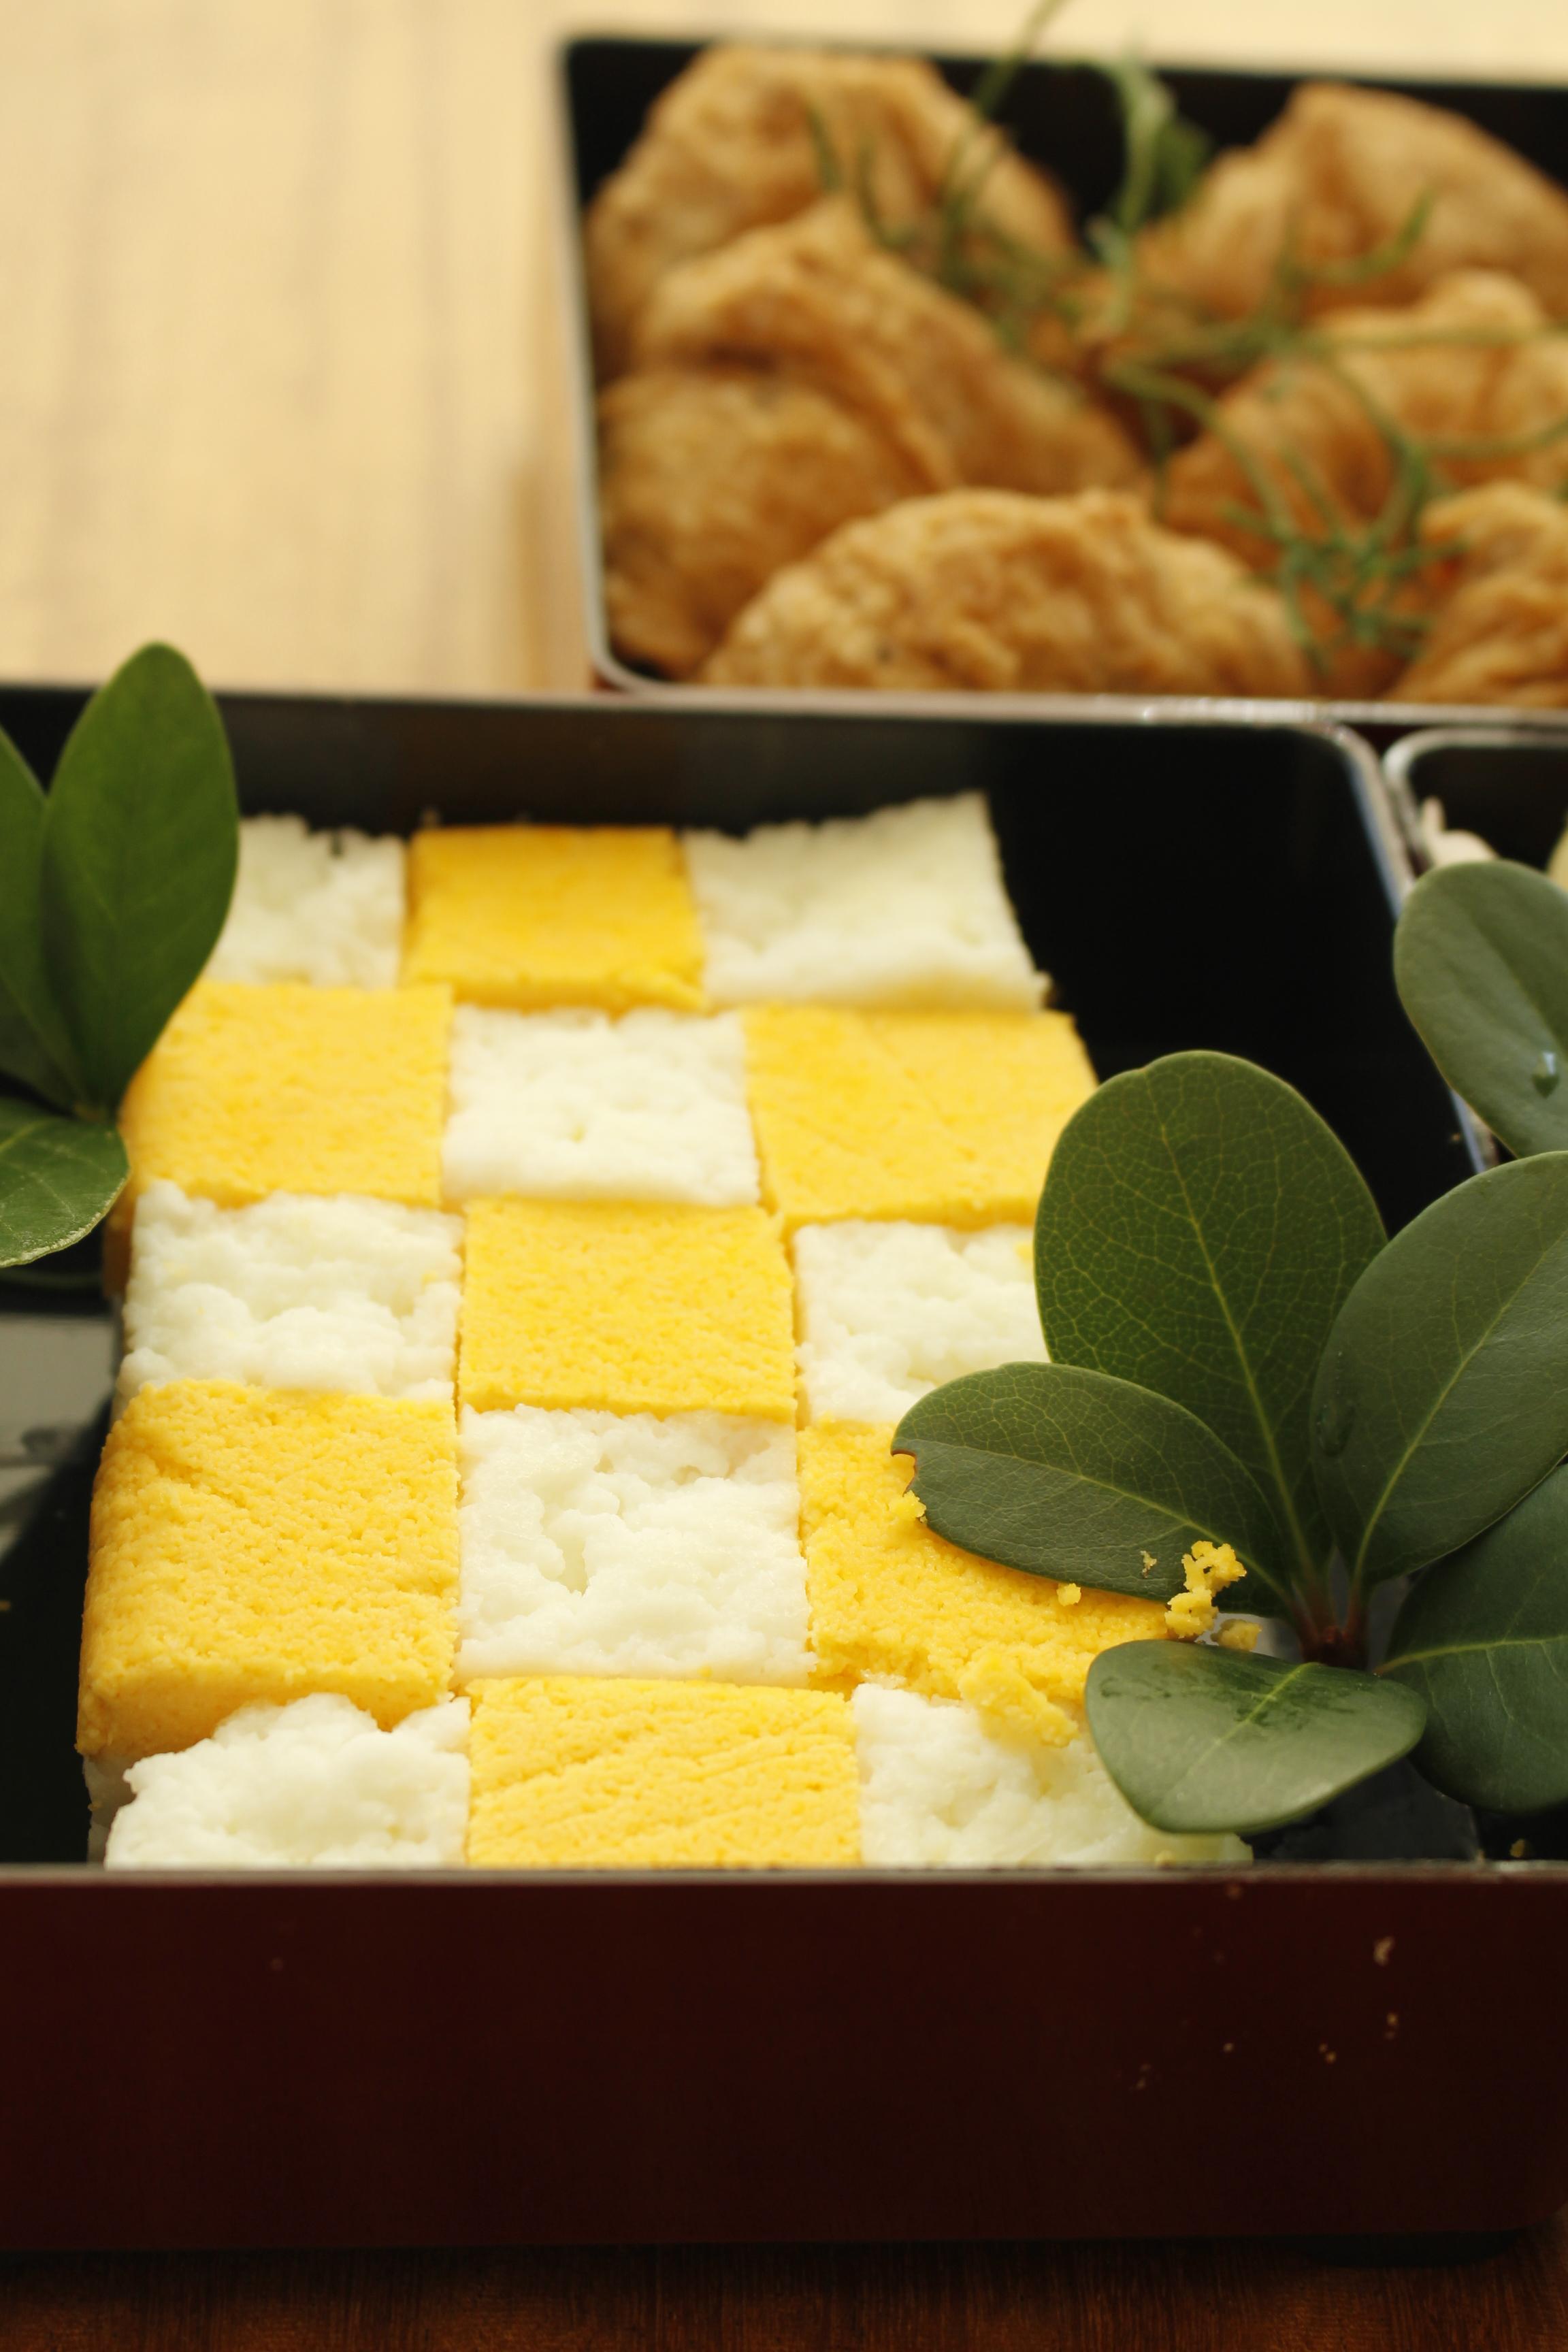 a-ta-sante糖質制限パン料理教室。11月度『糖質制限家庭料理教室』最終日、大盛況で終了。阿倍野区西田辺。a-ta-sant'e.